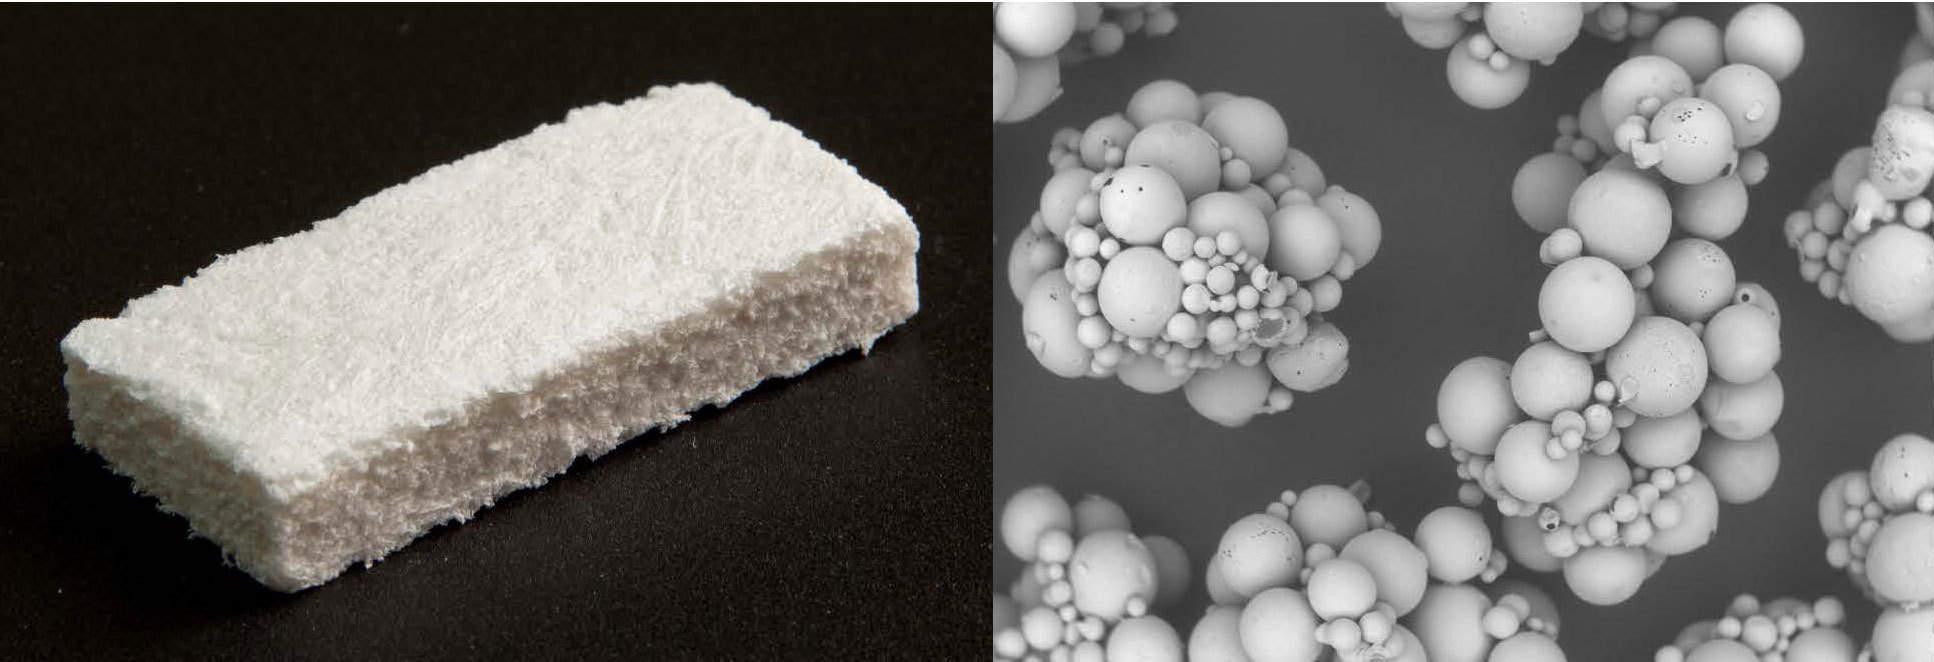 Synergy wins FDA nod for BioSphere Flex strip-format bone graft product